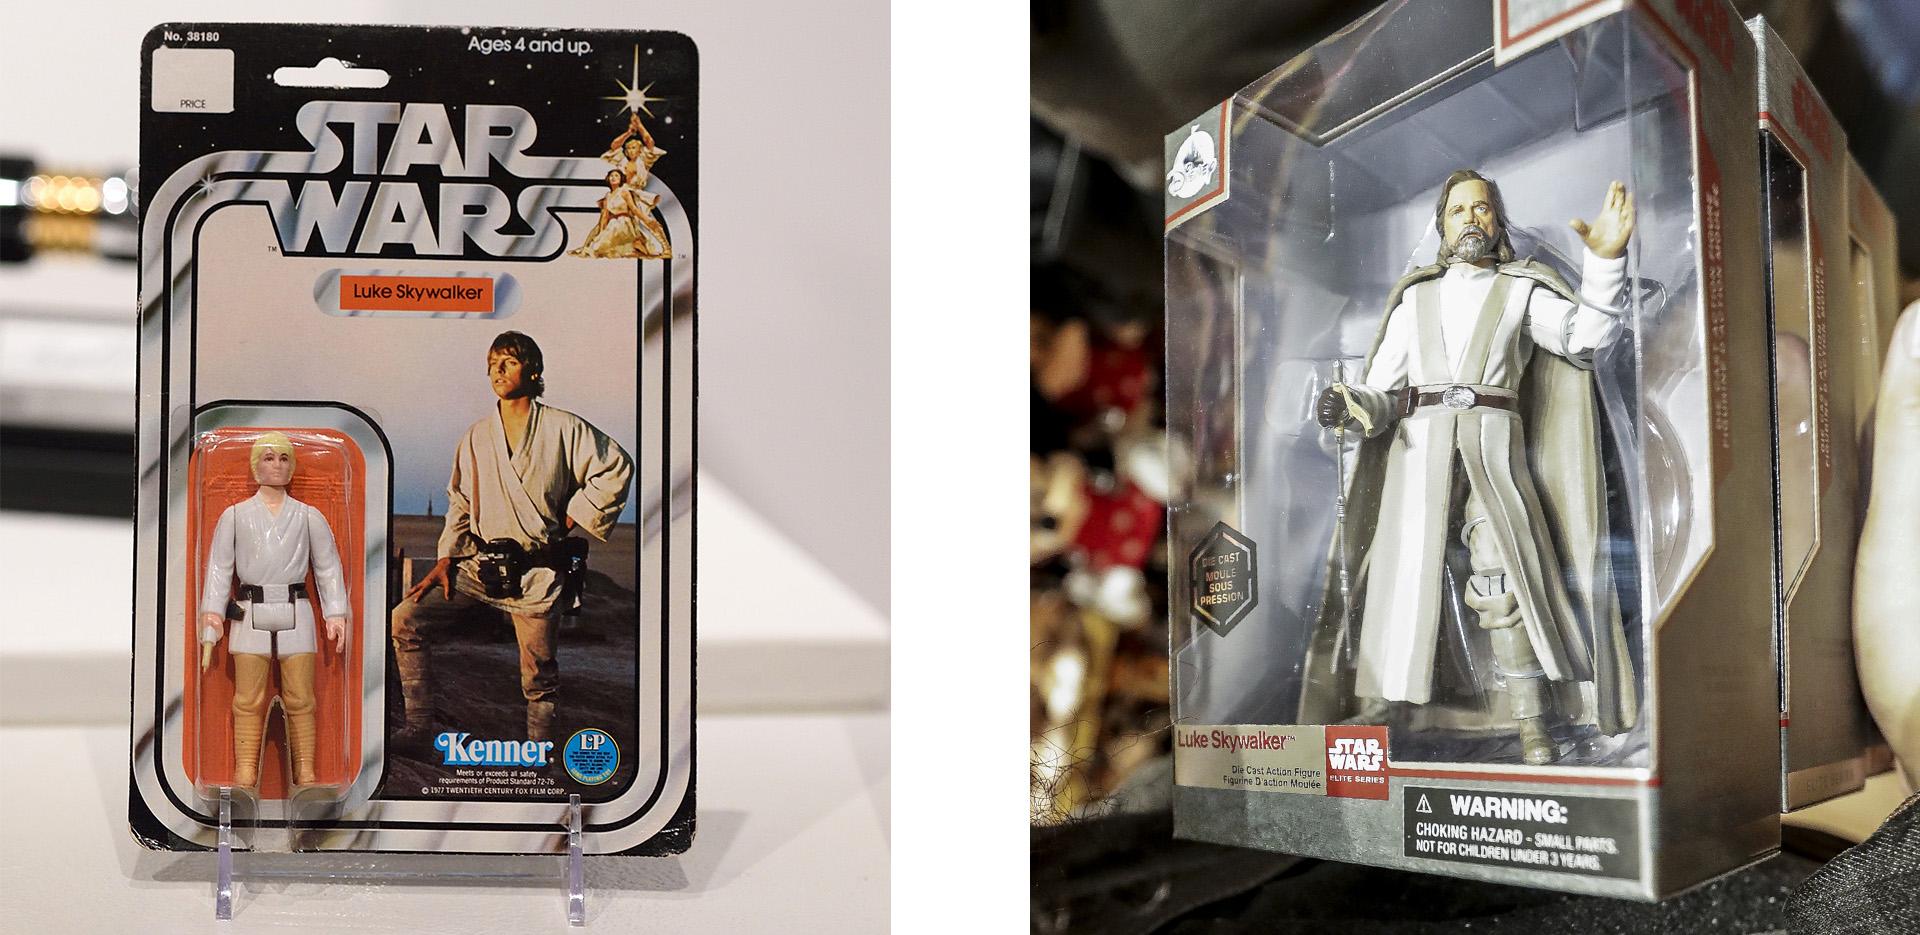 1970s Luke Skywalker action figure (Credit: Don Emmert/AFP/Getty Images) and Luke Skywalker, from Star Wars: The Last Jedi, action figure (Credit: Jeenah Moon/Bloomberg via Getty Images)